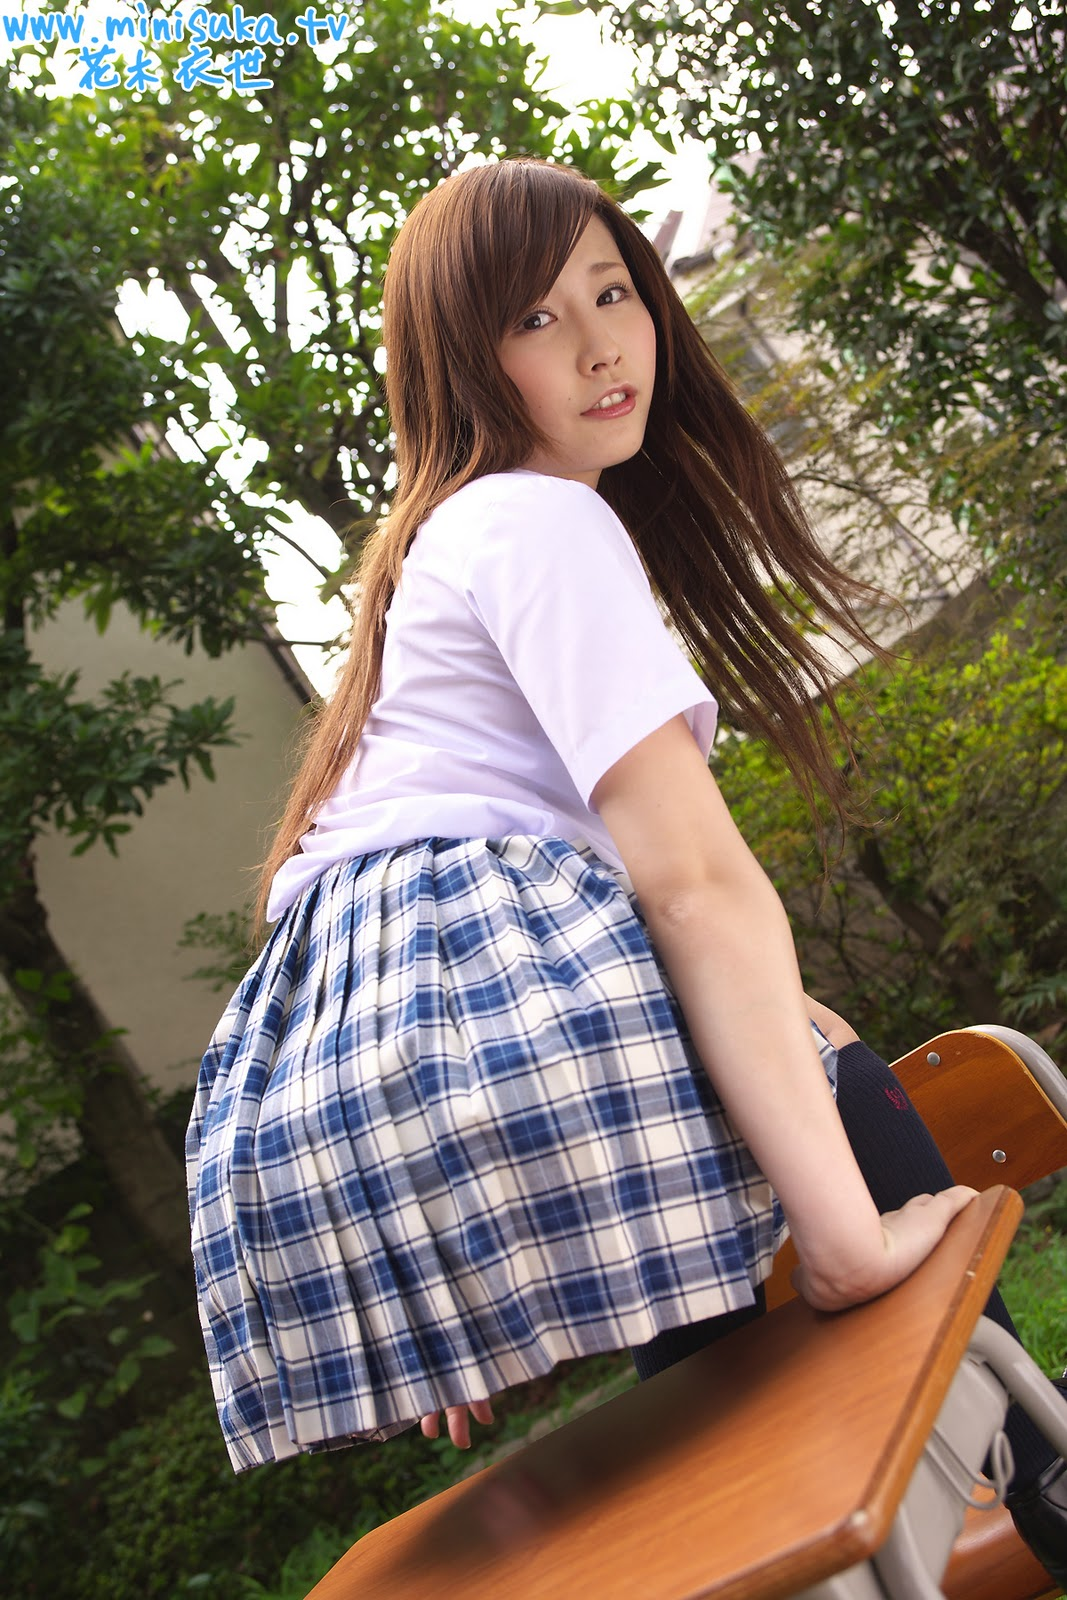 Asian schoolgirl pedal pumping, nude dentistry